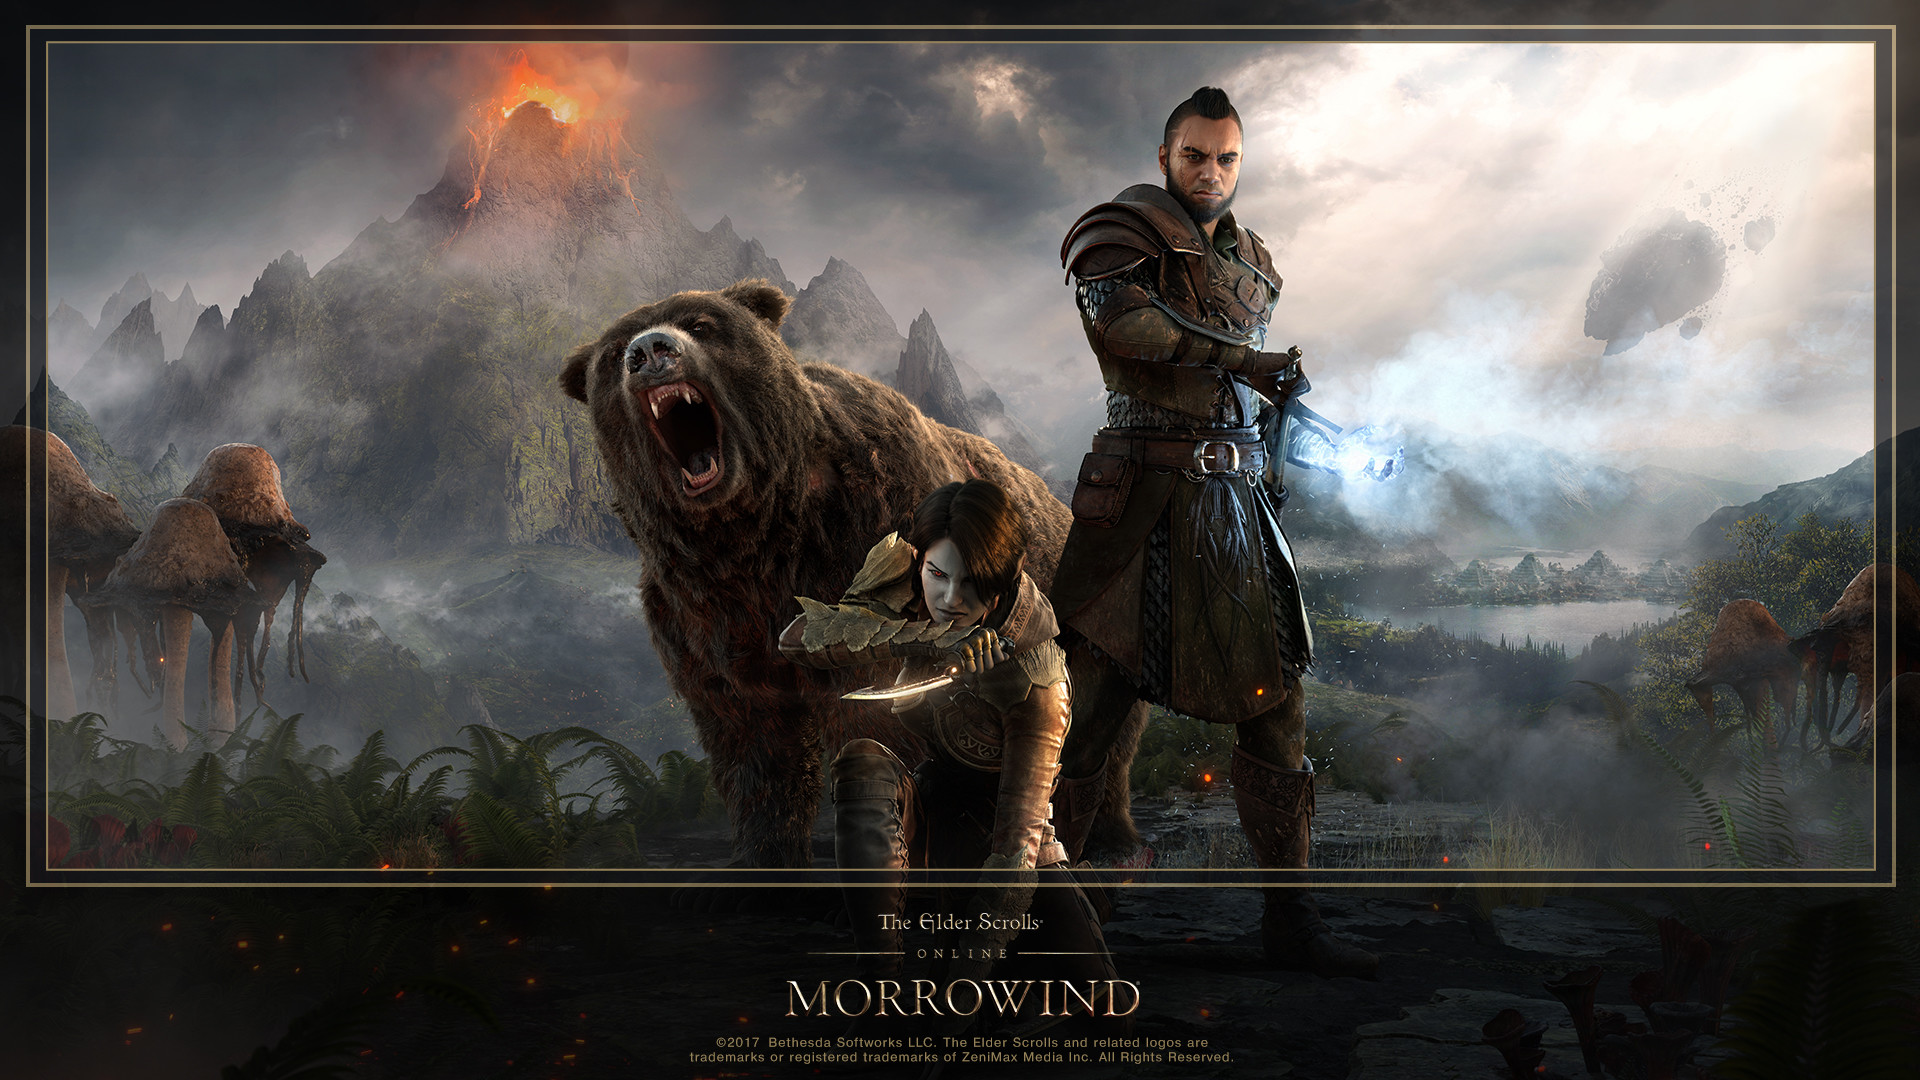 Download the New ESO: Morrowind Hero Art Wallpaper